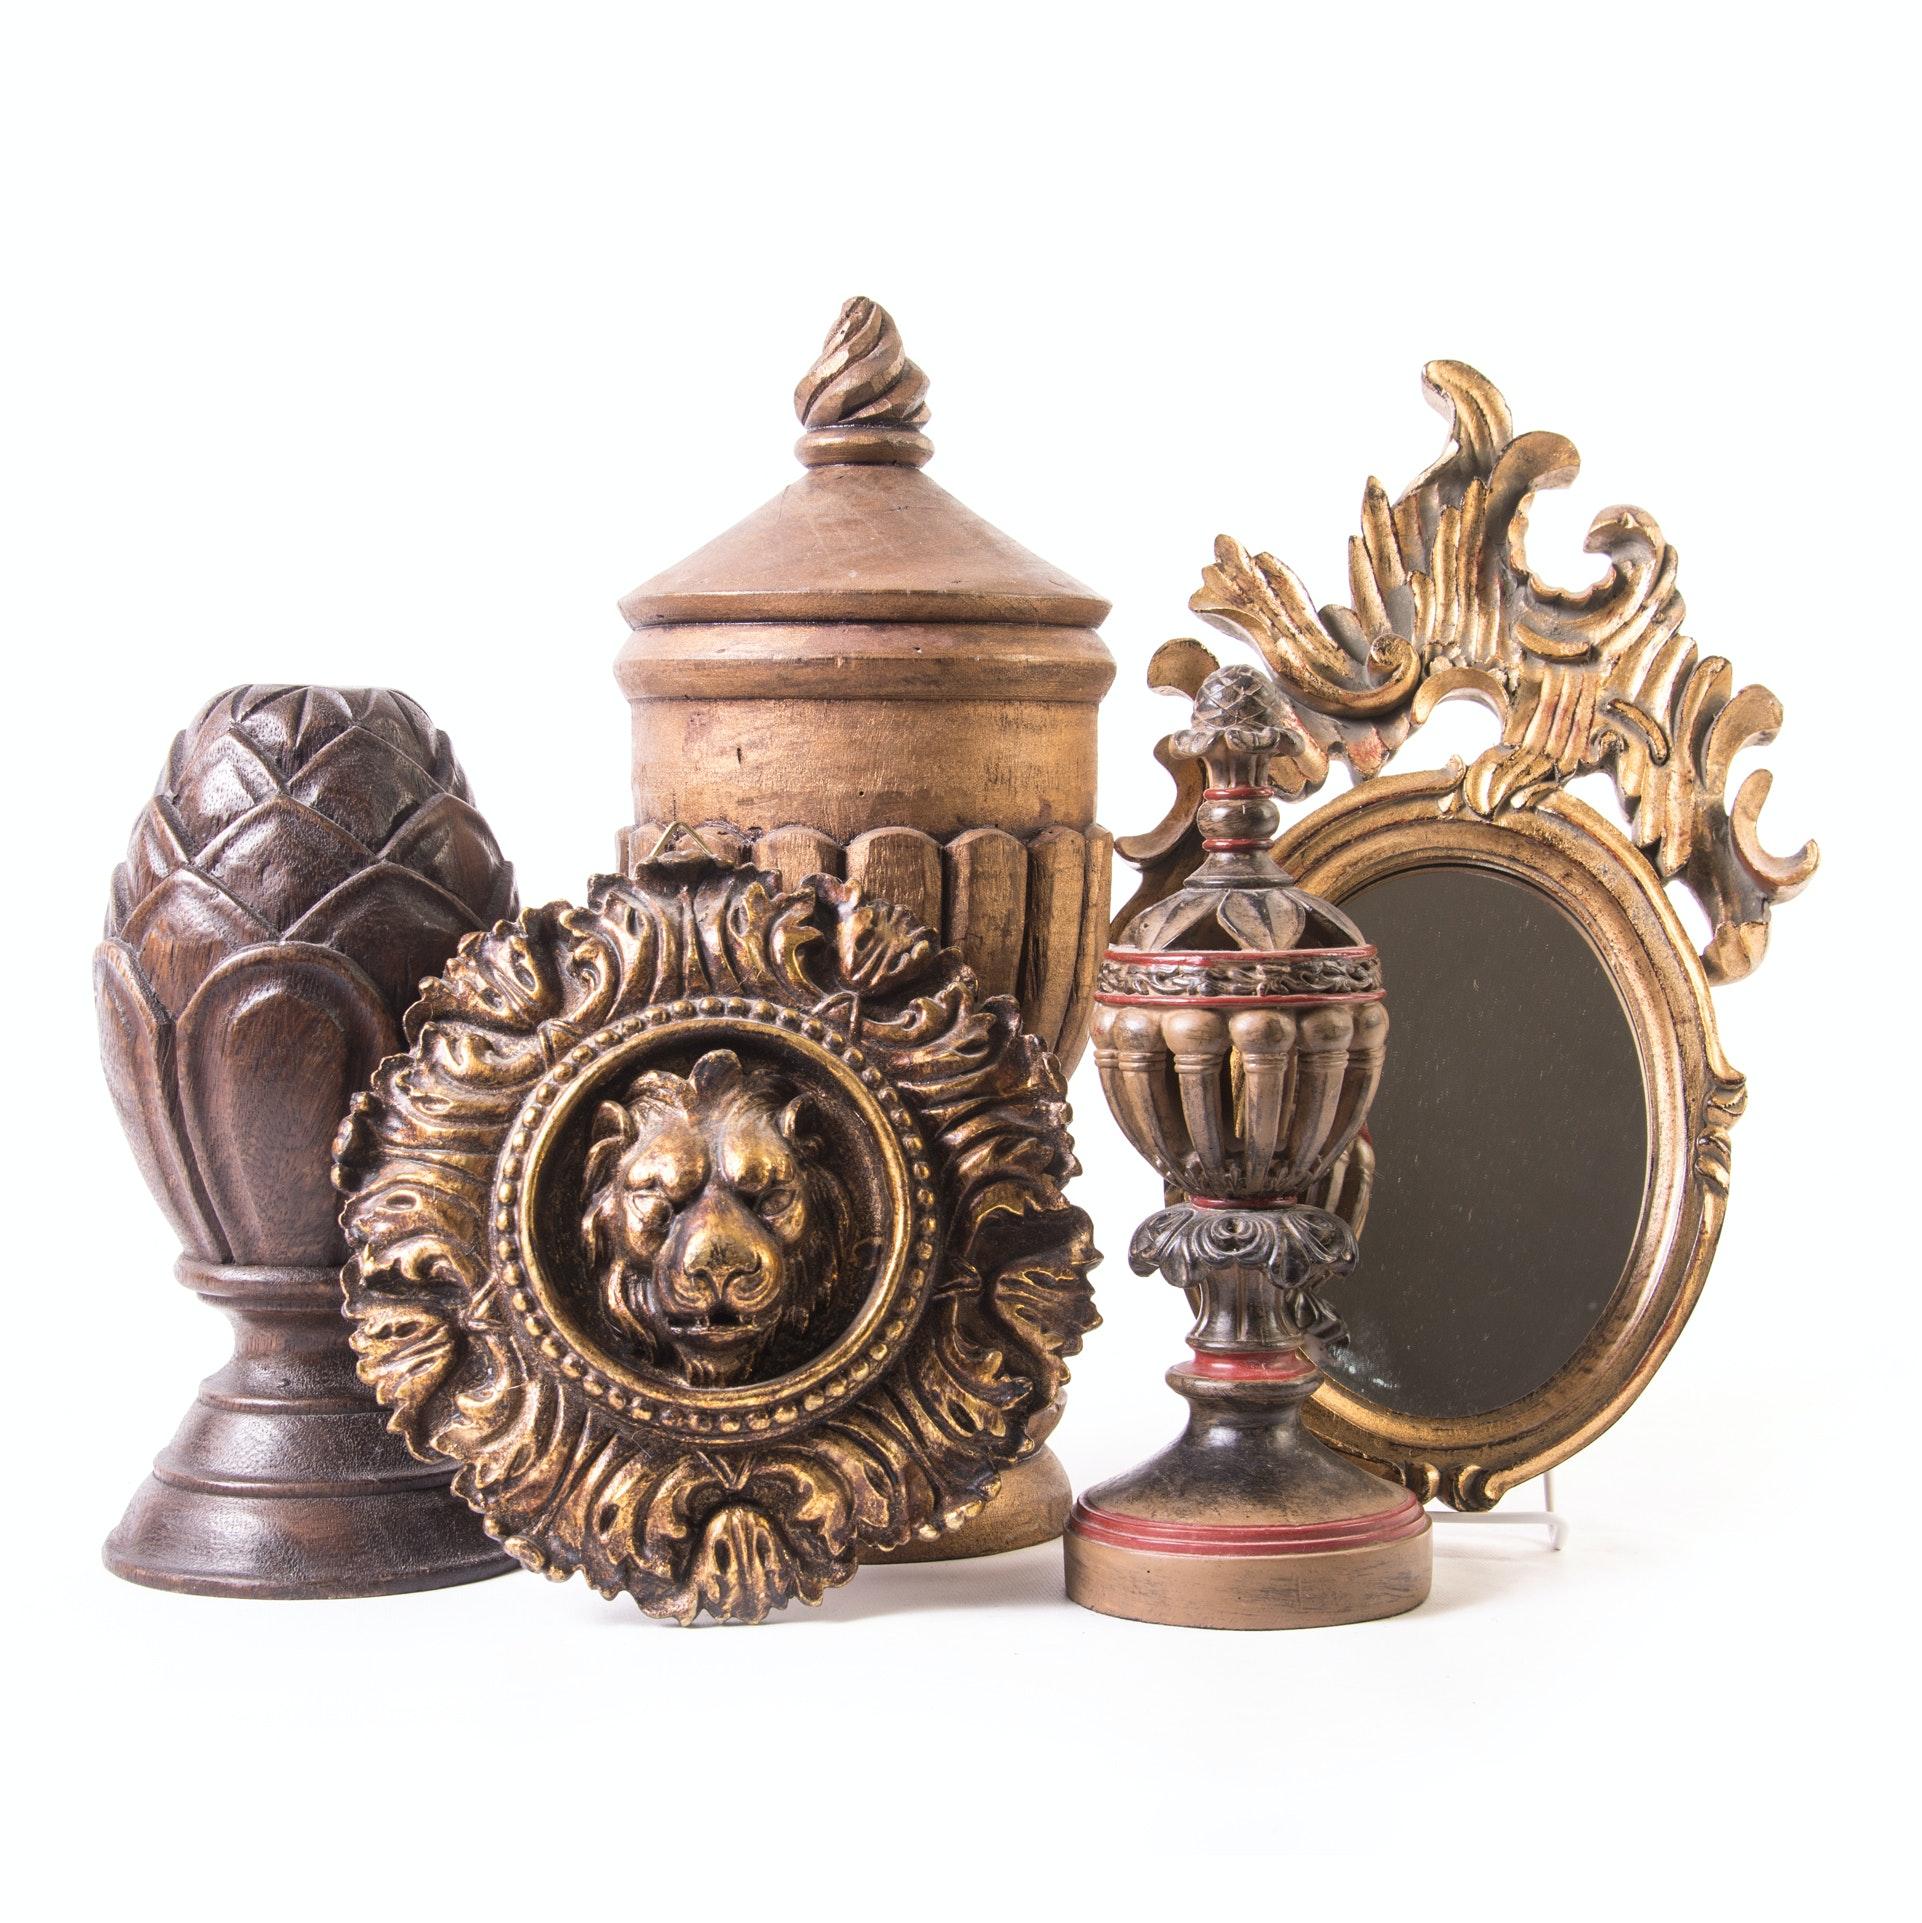 Neoclassical Decorative Finials and Decor